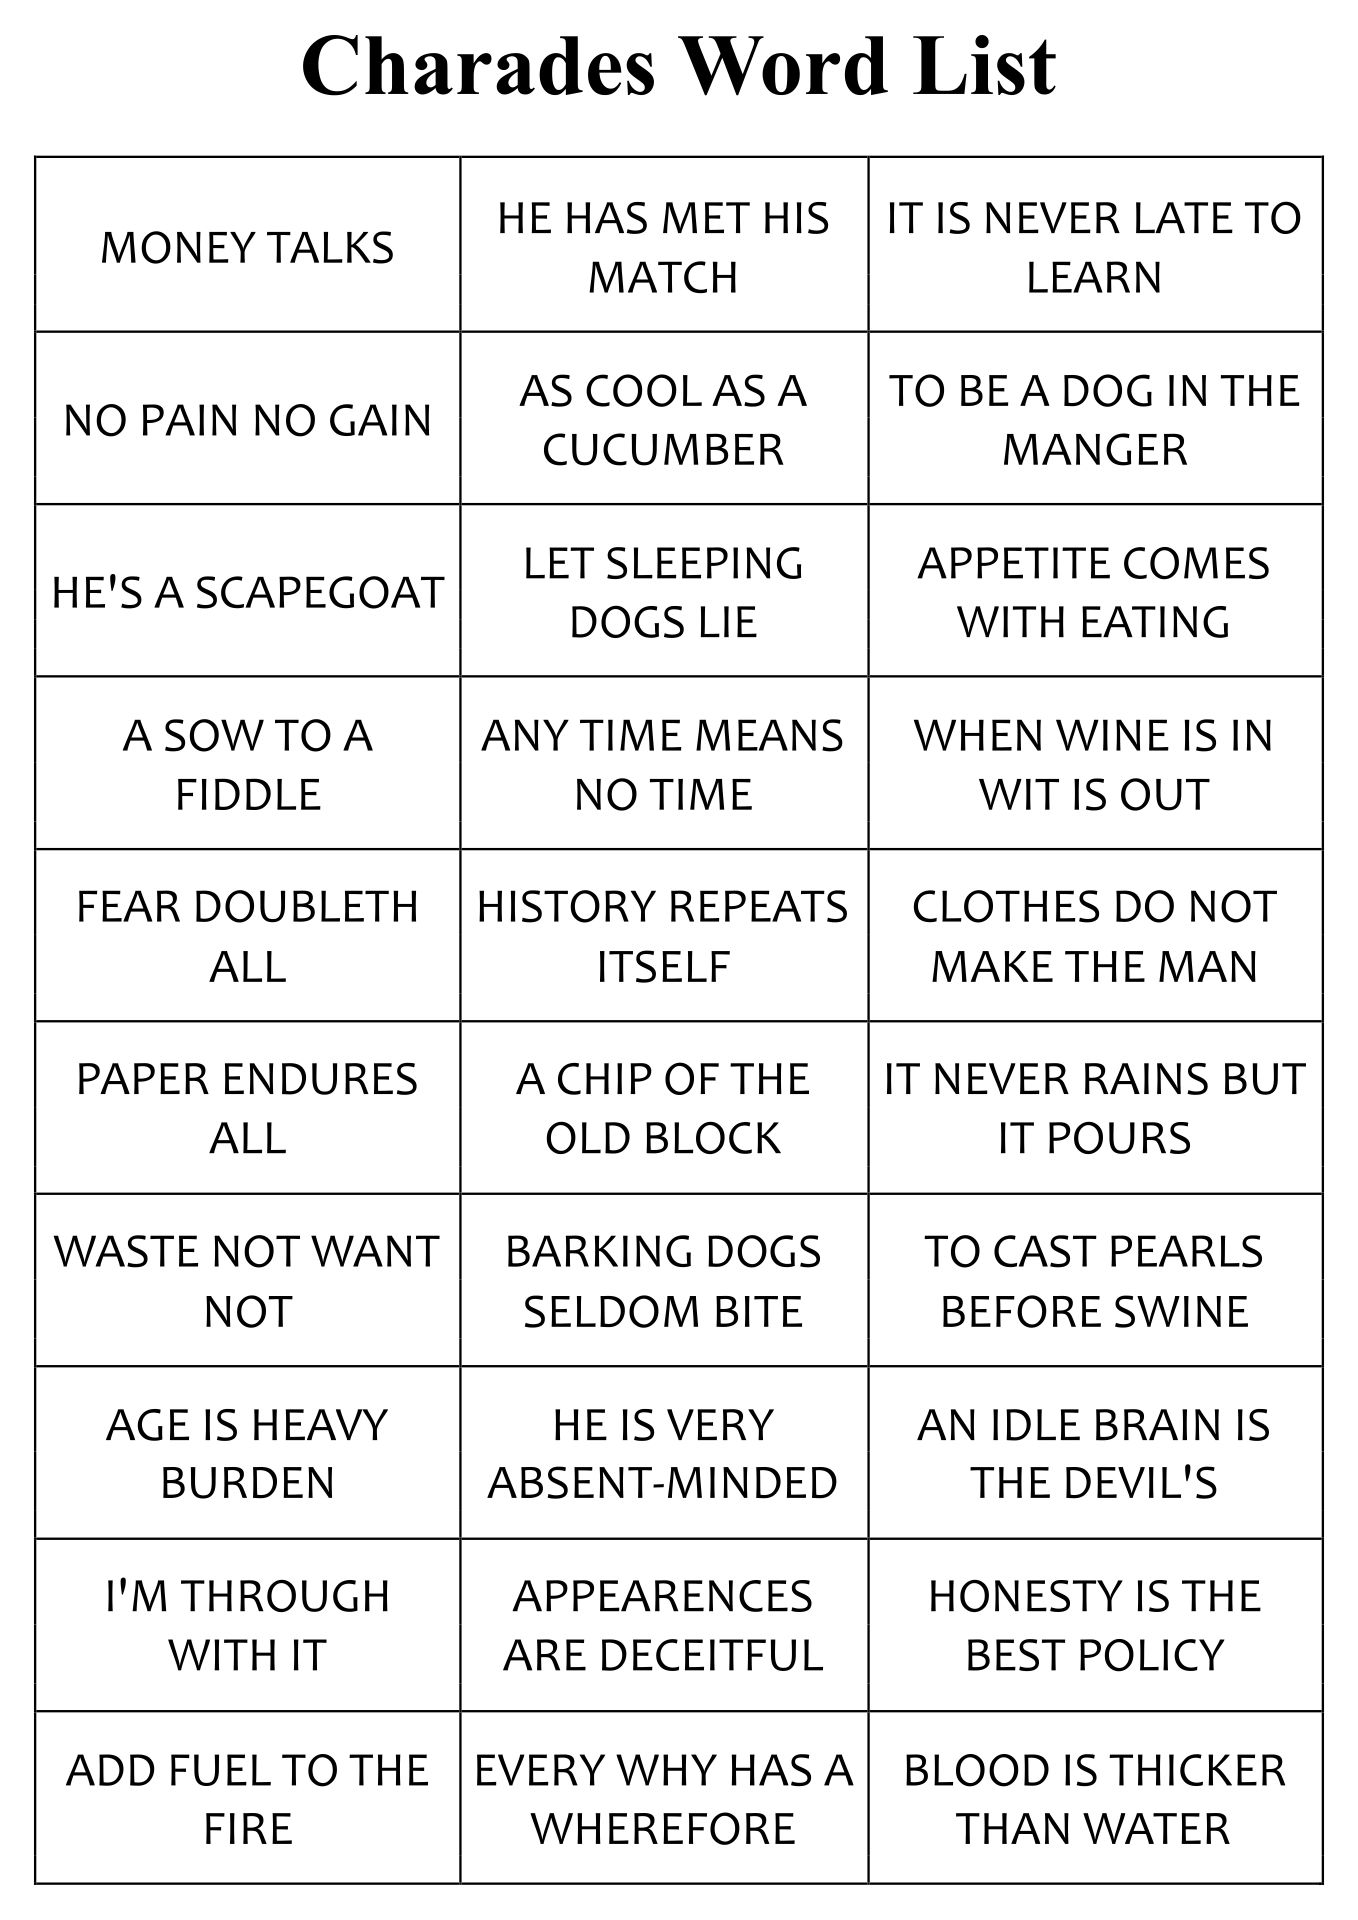 Charades Word List